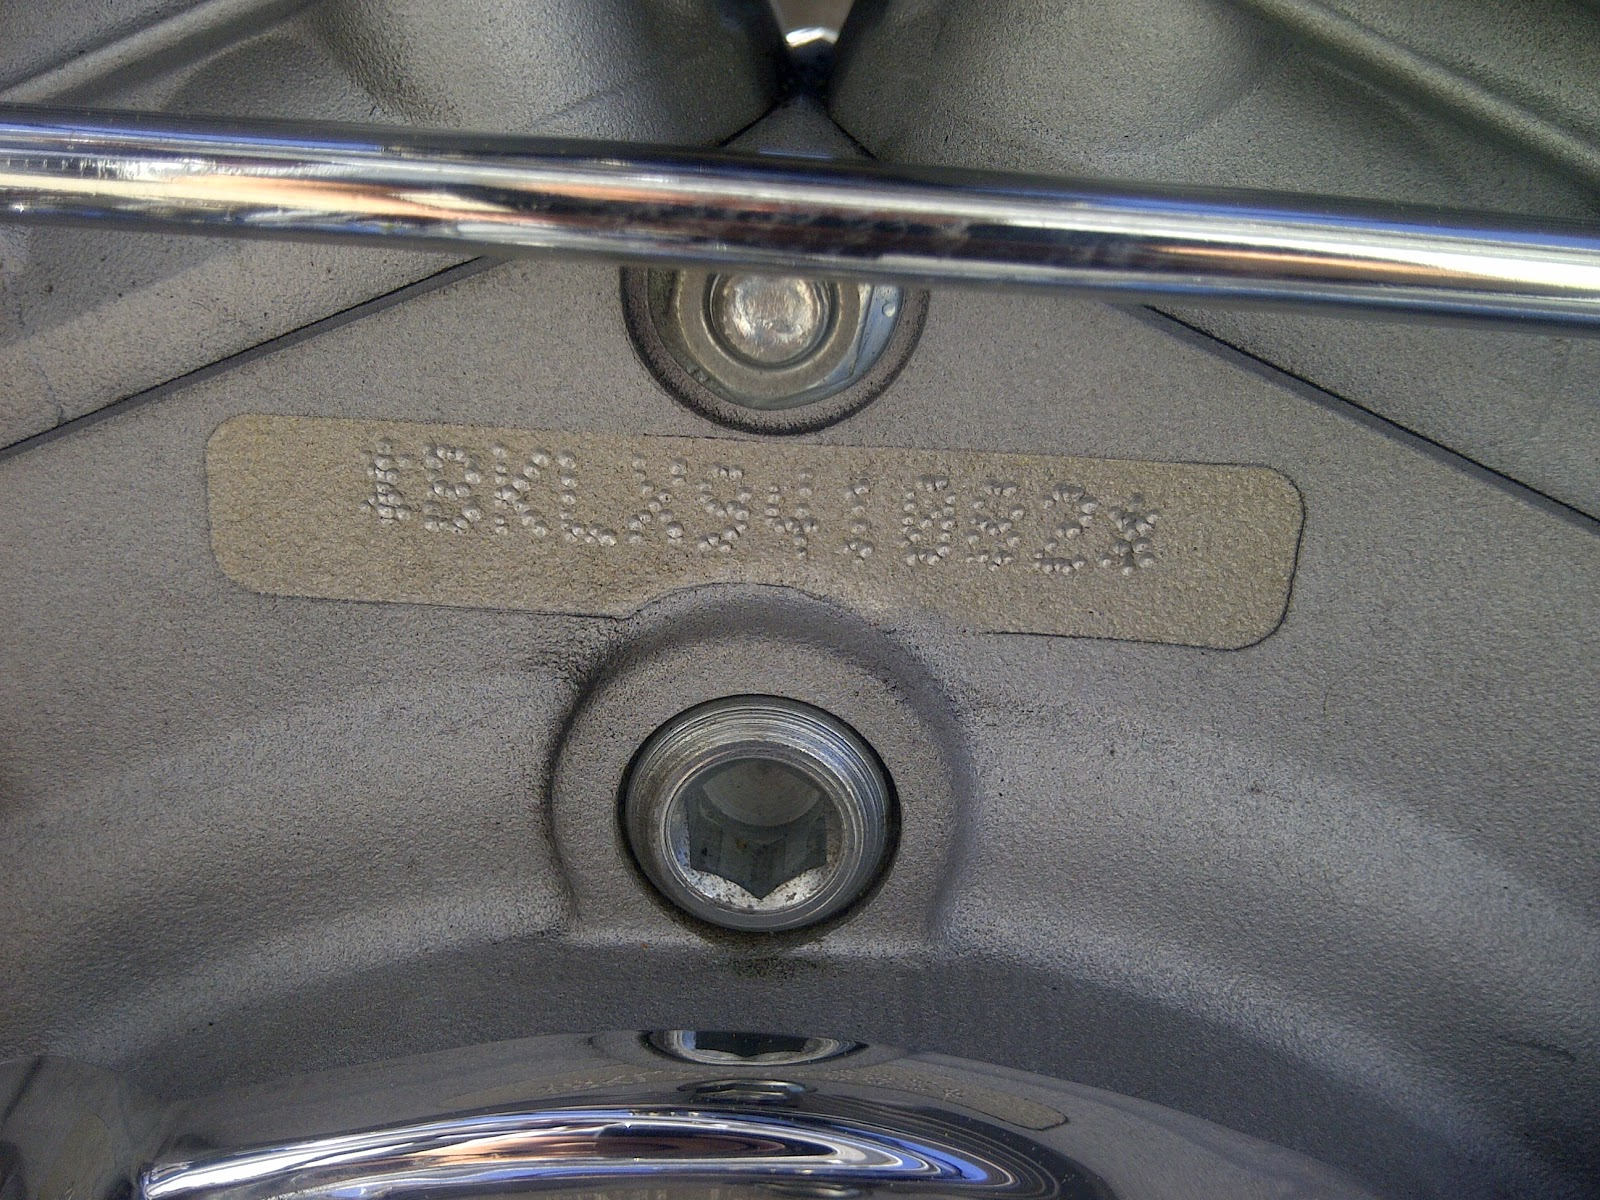 Cool Looking Bobber ,1999 Evo Rigid soft tail springer front